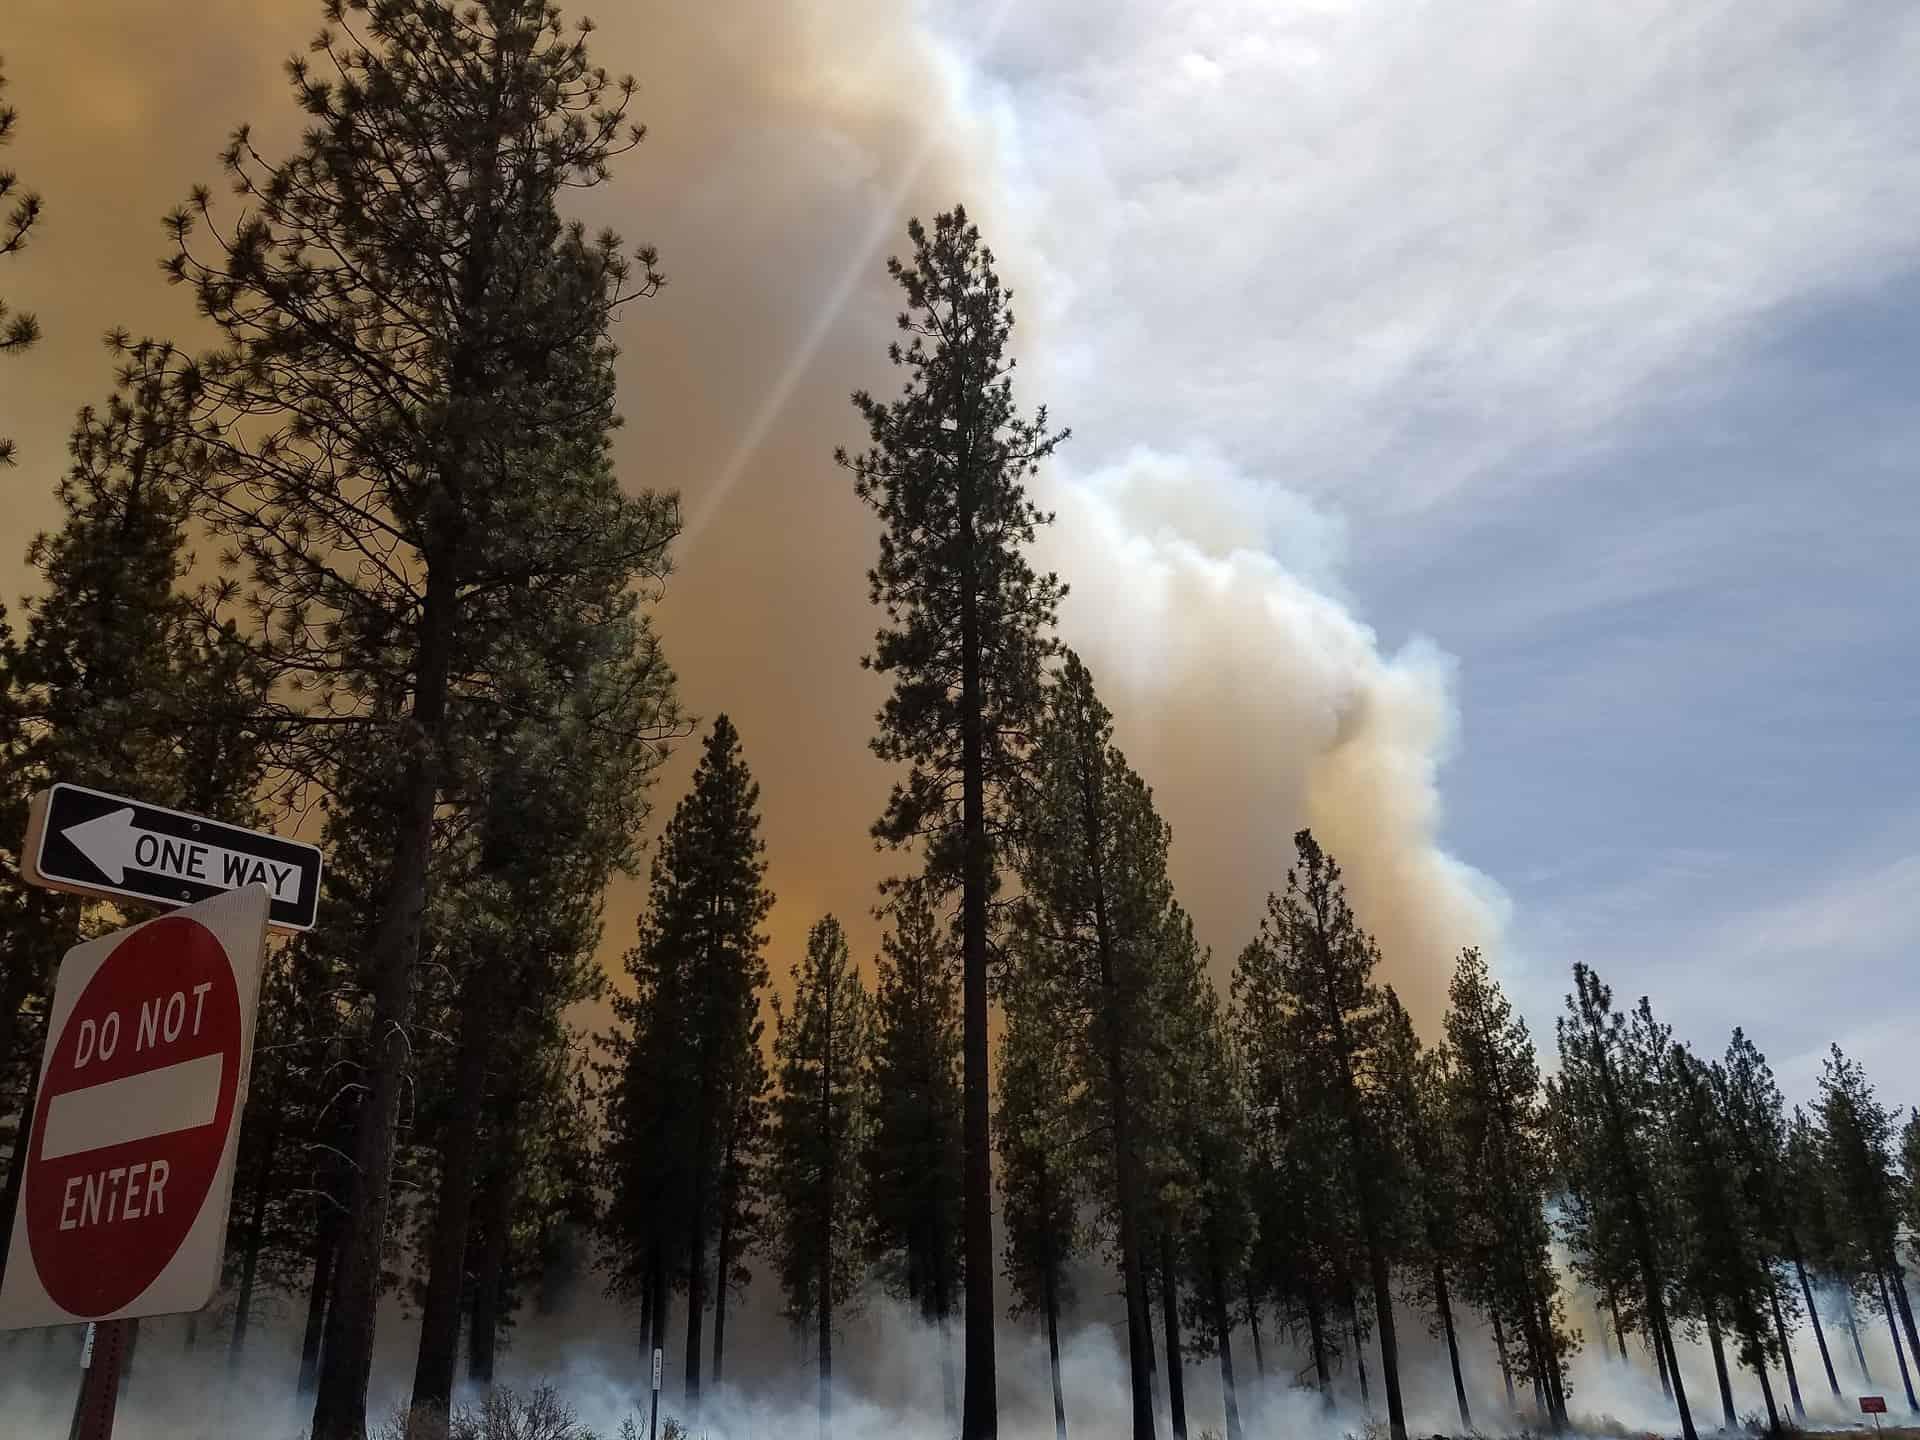 Smoke rising above tall conifers